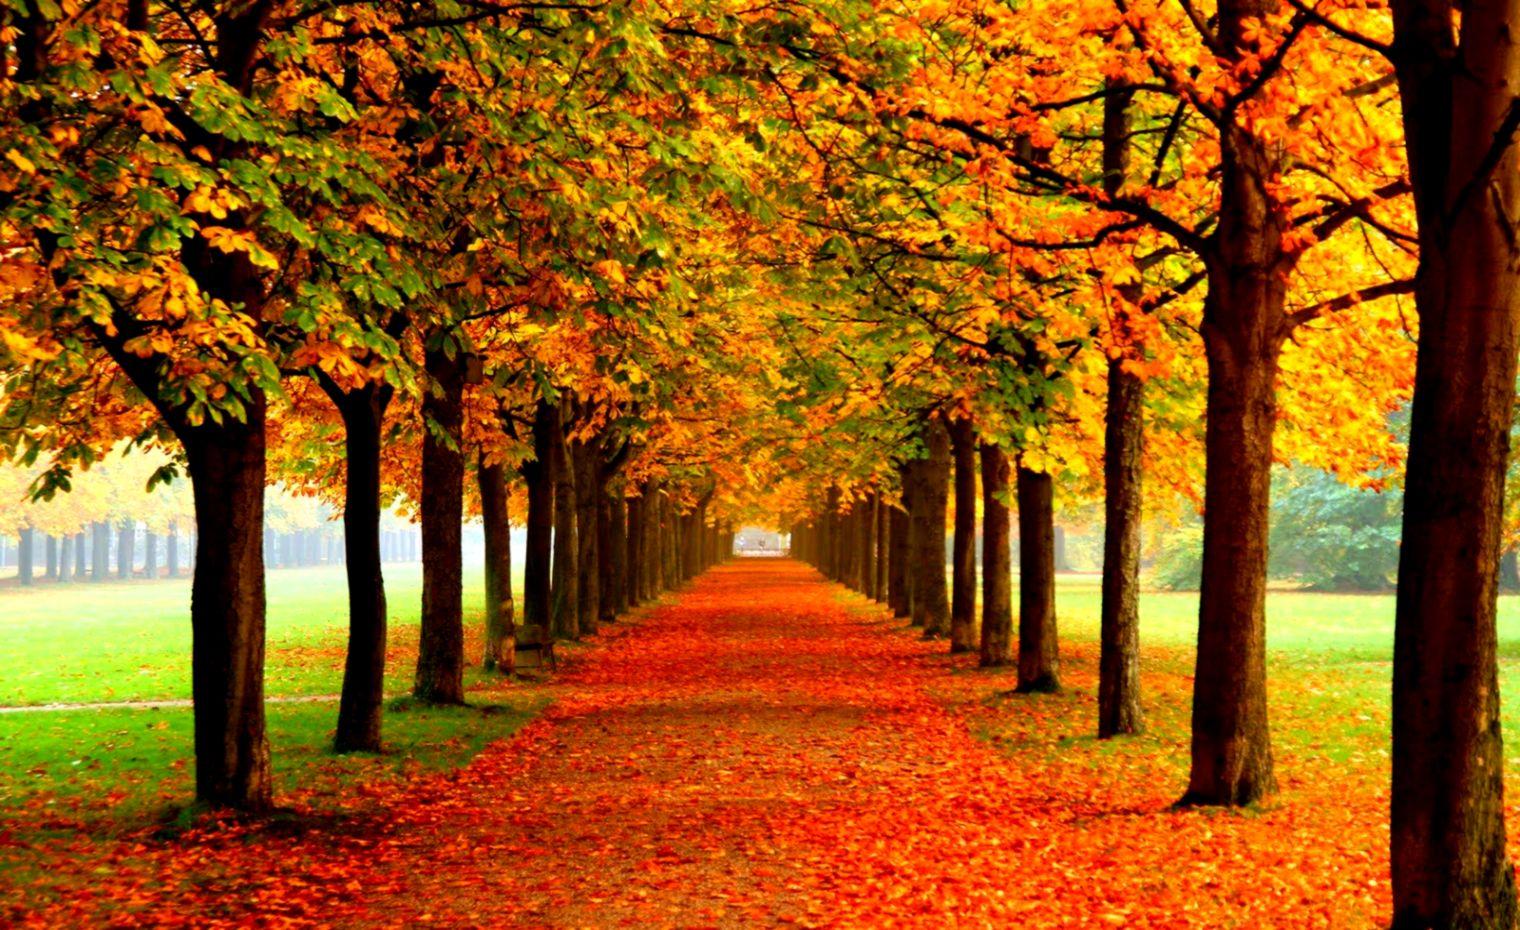 Autumn Leaves Wallpaper Autumn Leaf Hd Desktop Wallpaper Nami Island In August 1520x930 Wallpaper Teahub Io